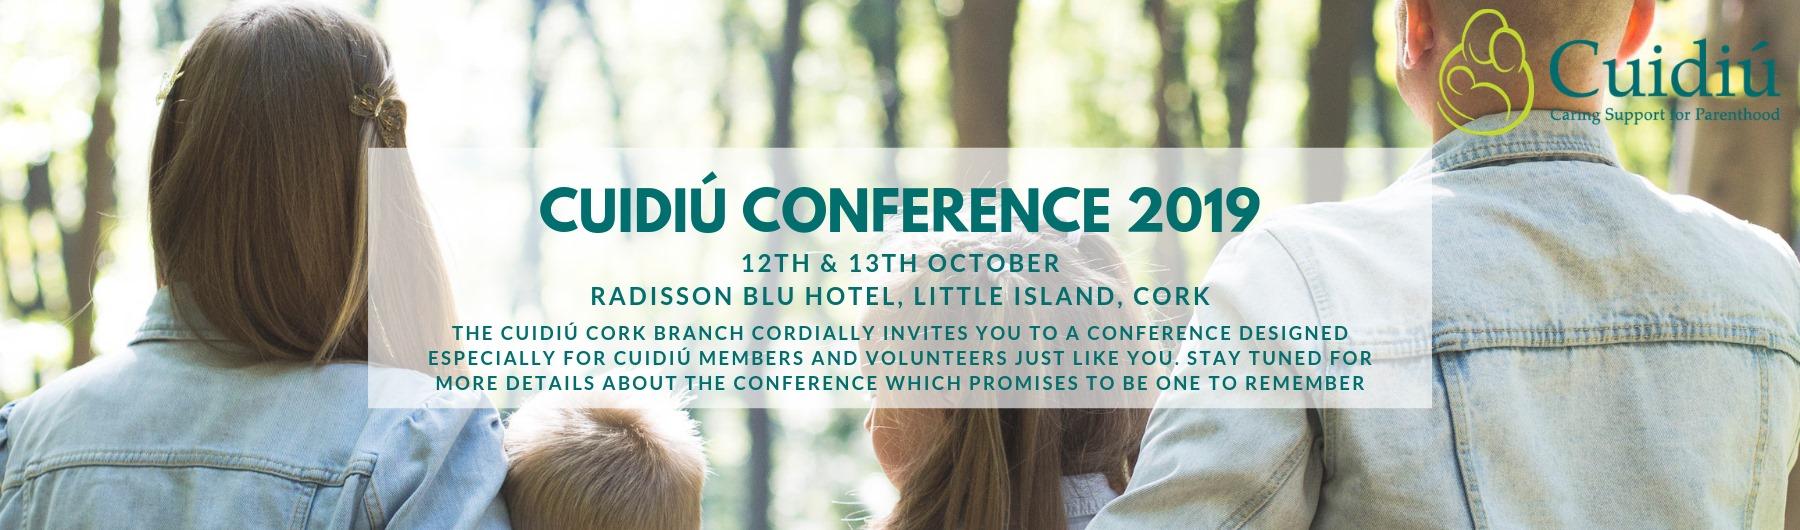 Cuidiú Conference 2019